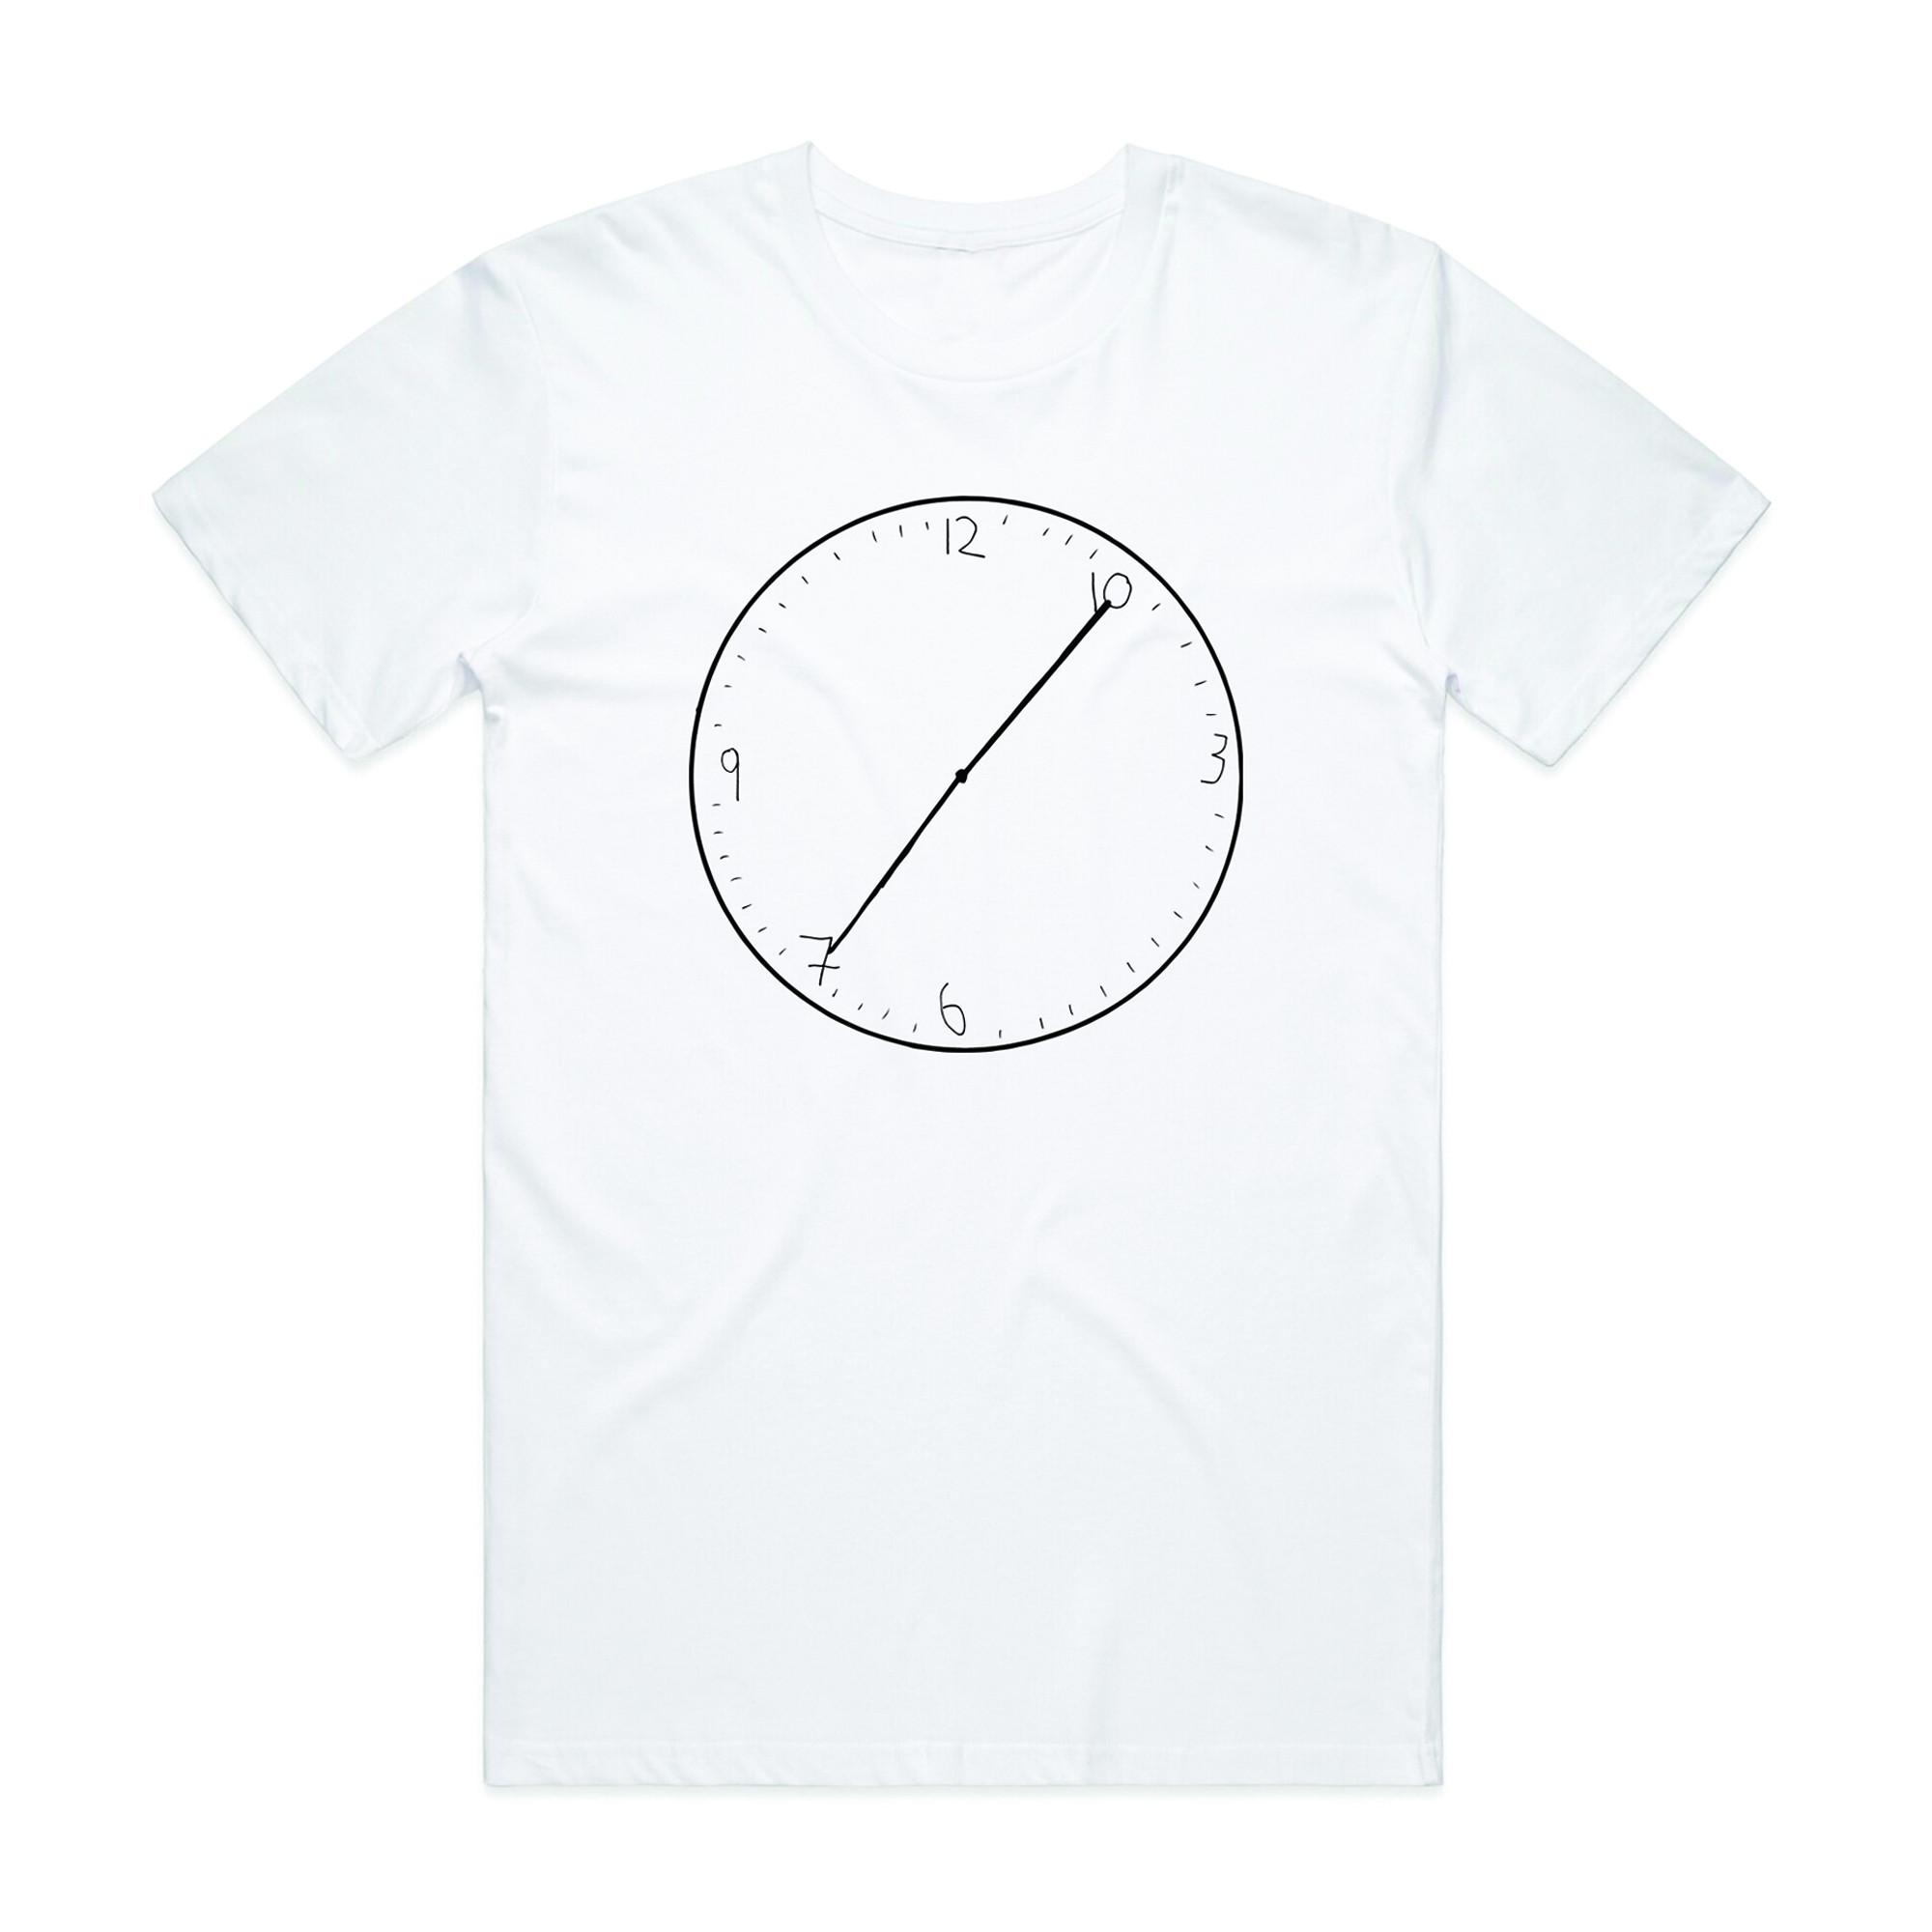 Carl Barron - Clock White Tee